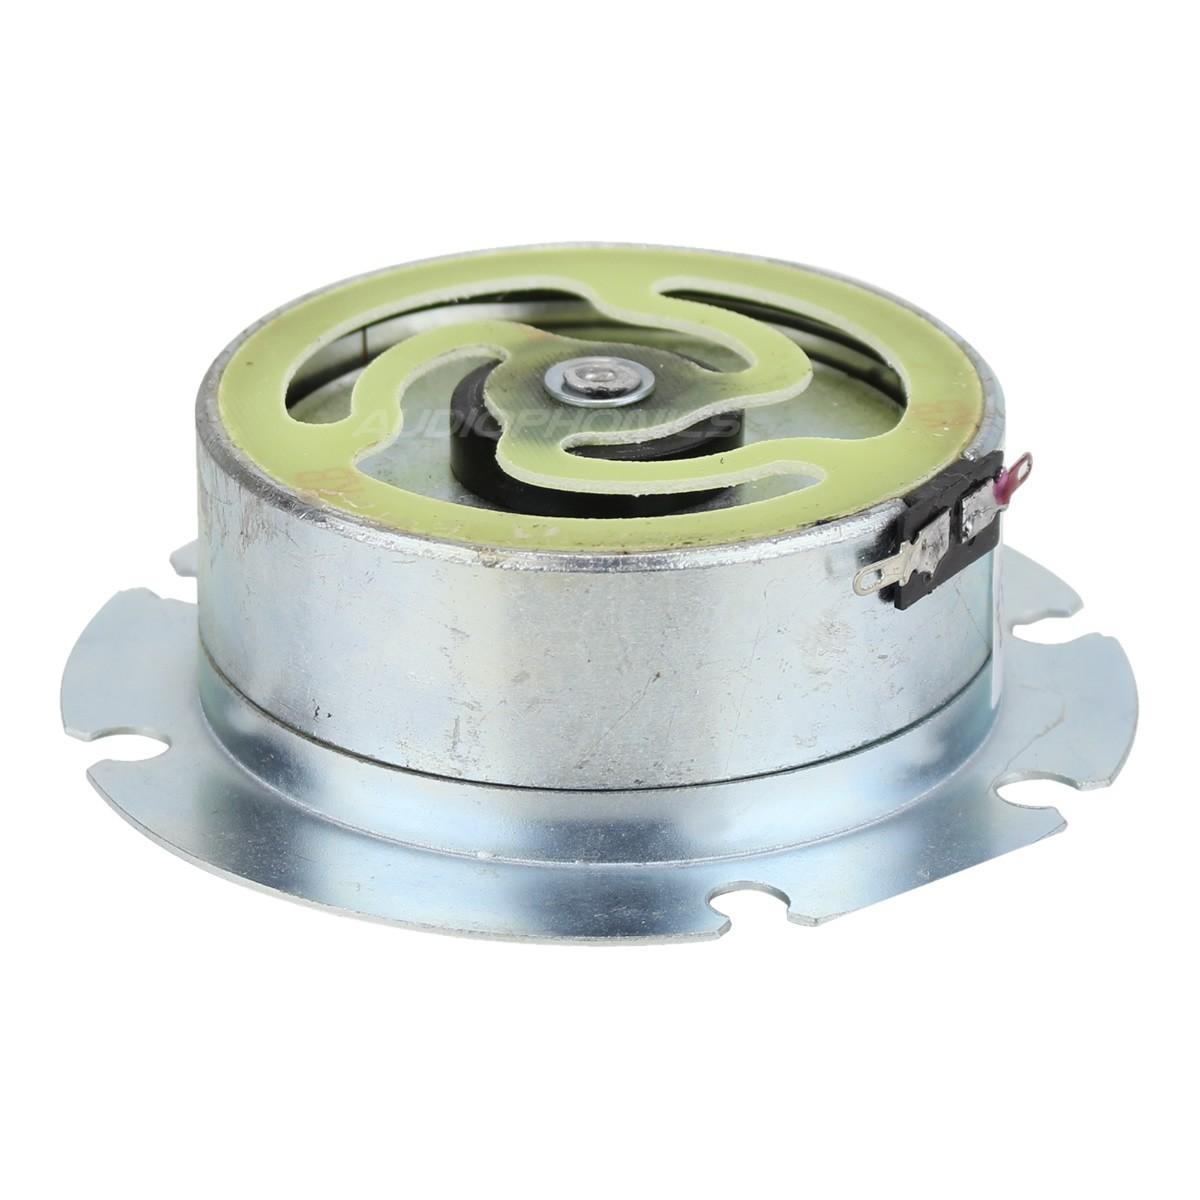 Haut-parleur vibreur Body shaker 100W